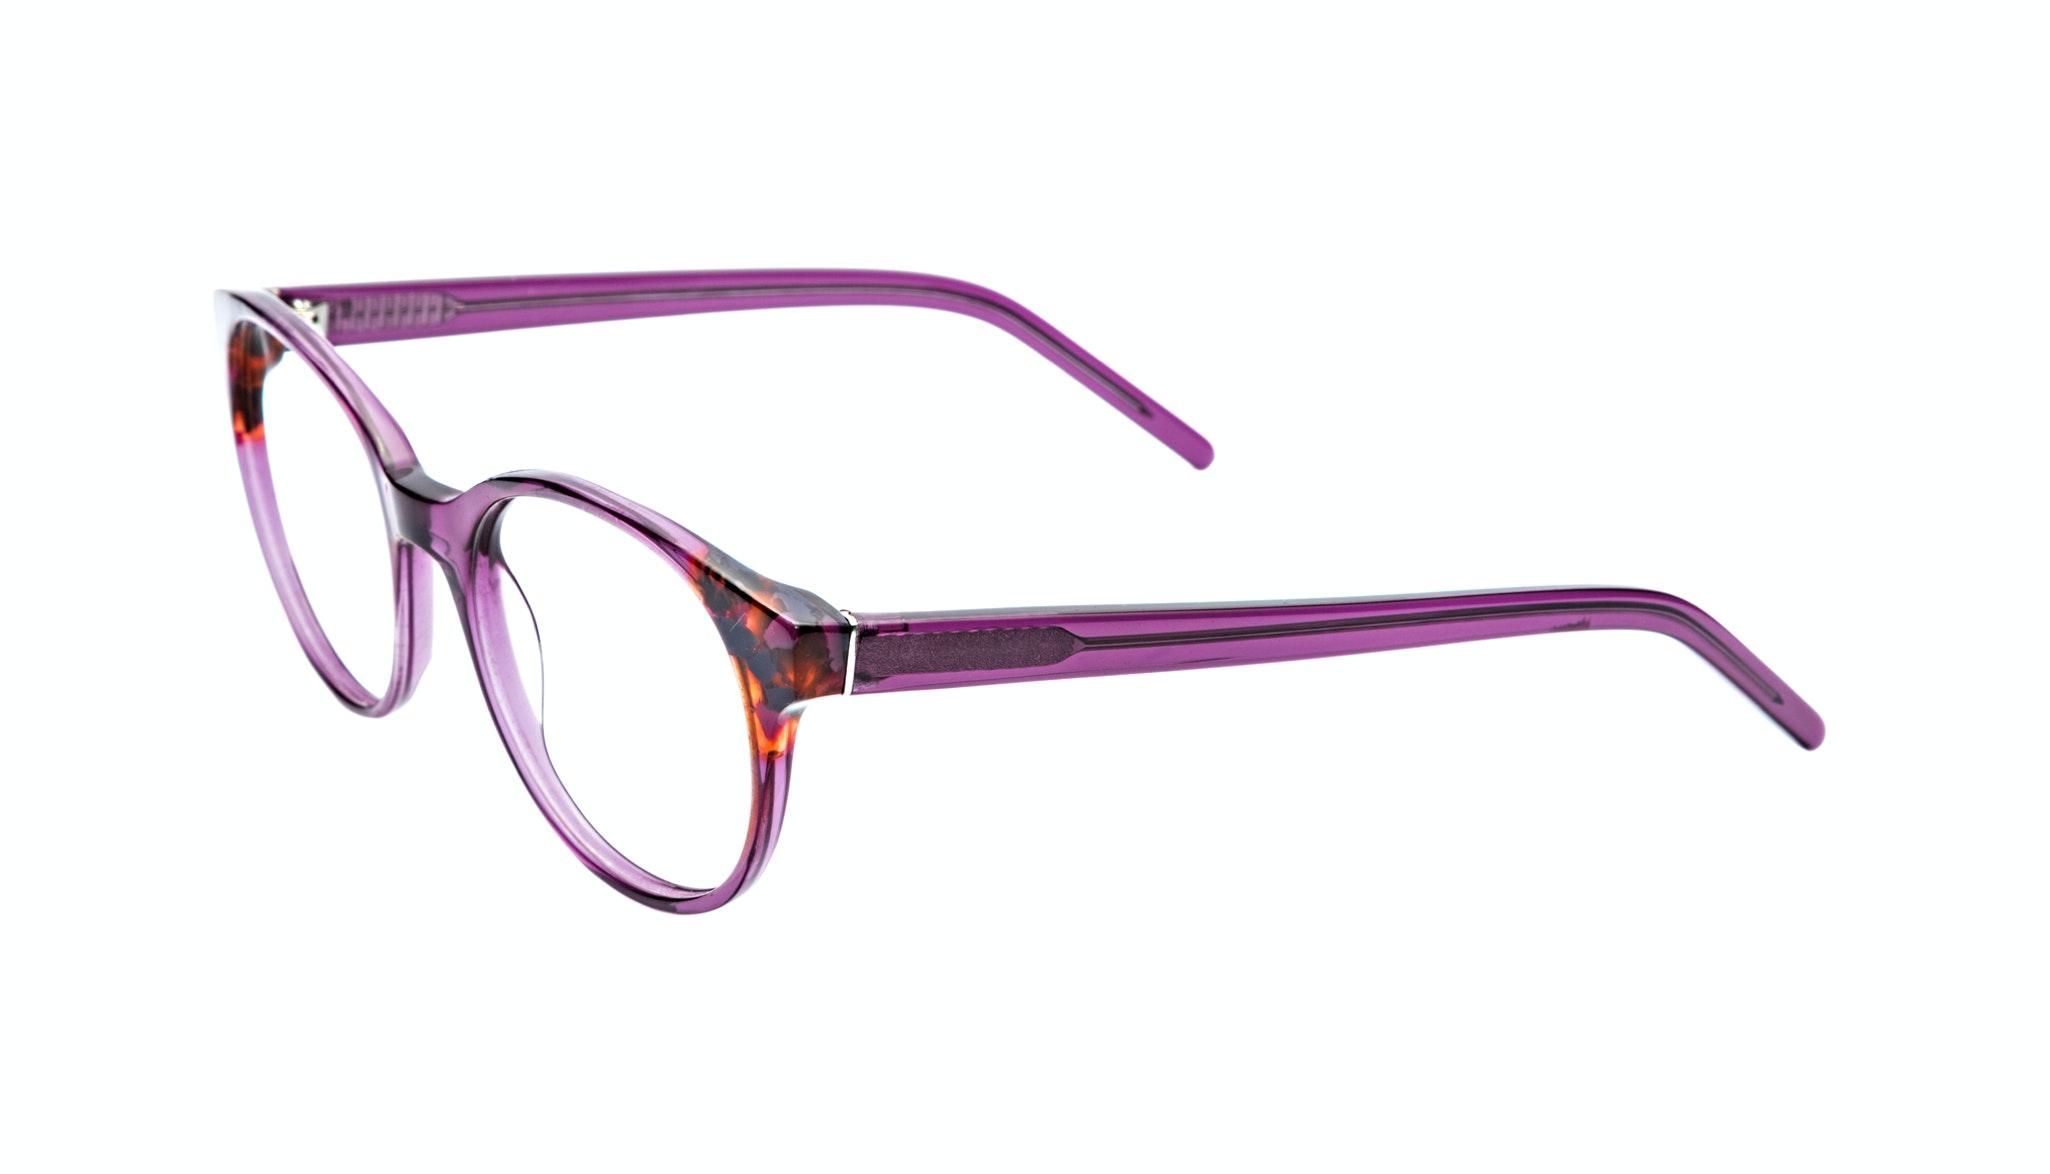 Affordable Fashion Glasses Round Eyeglasses Women Bis Pretty Purple Tilt